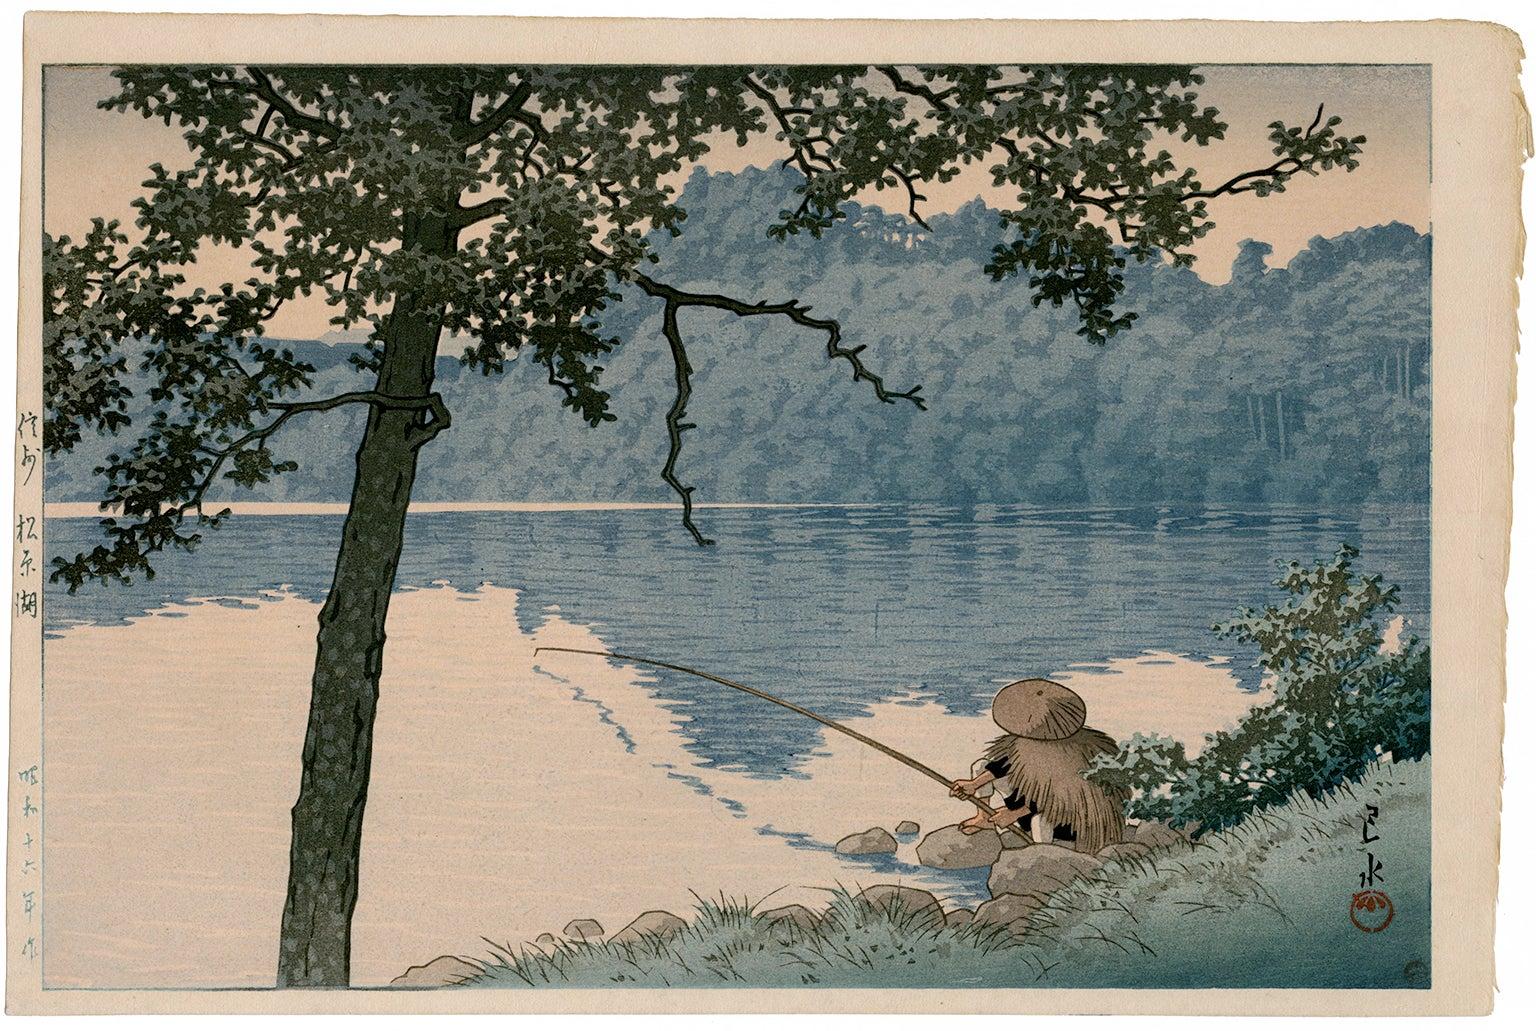 Kawase Hasui - Shinshu Matsubarako (Lake Matsubara, Shinshu) For Sale at  1stDibs